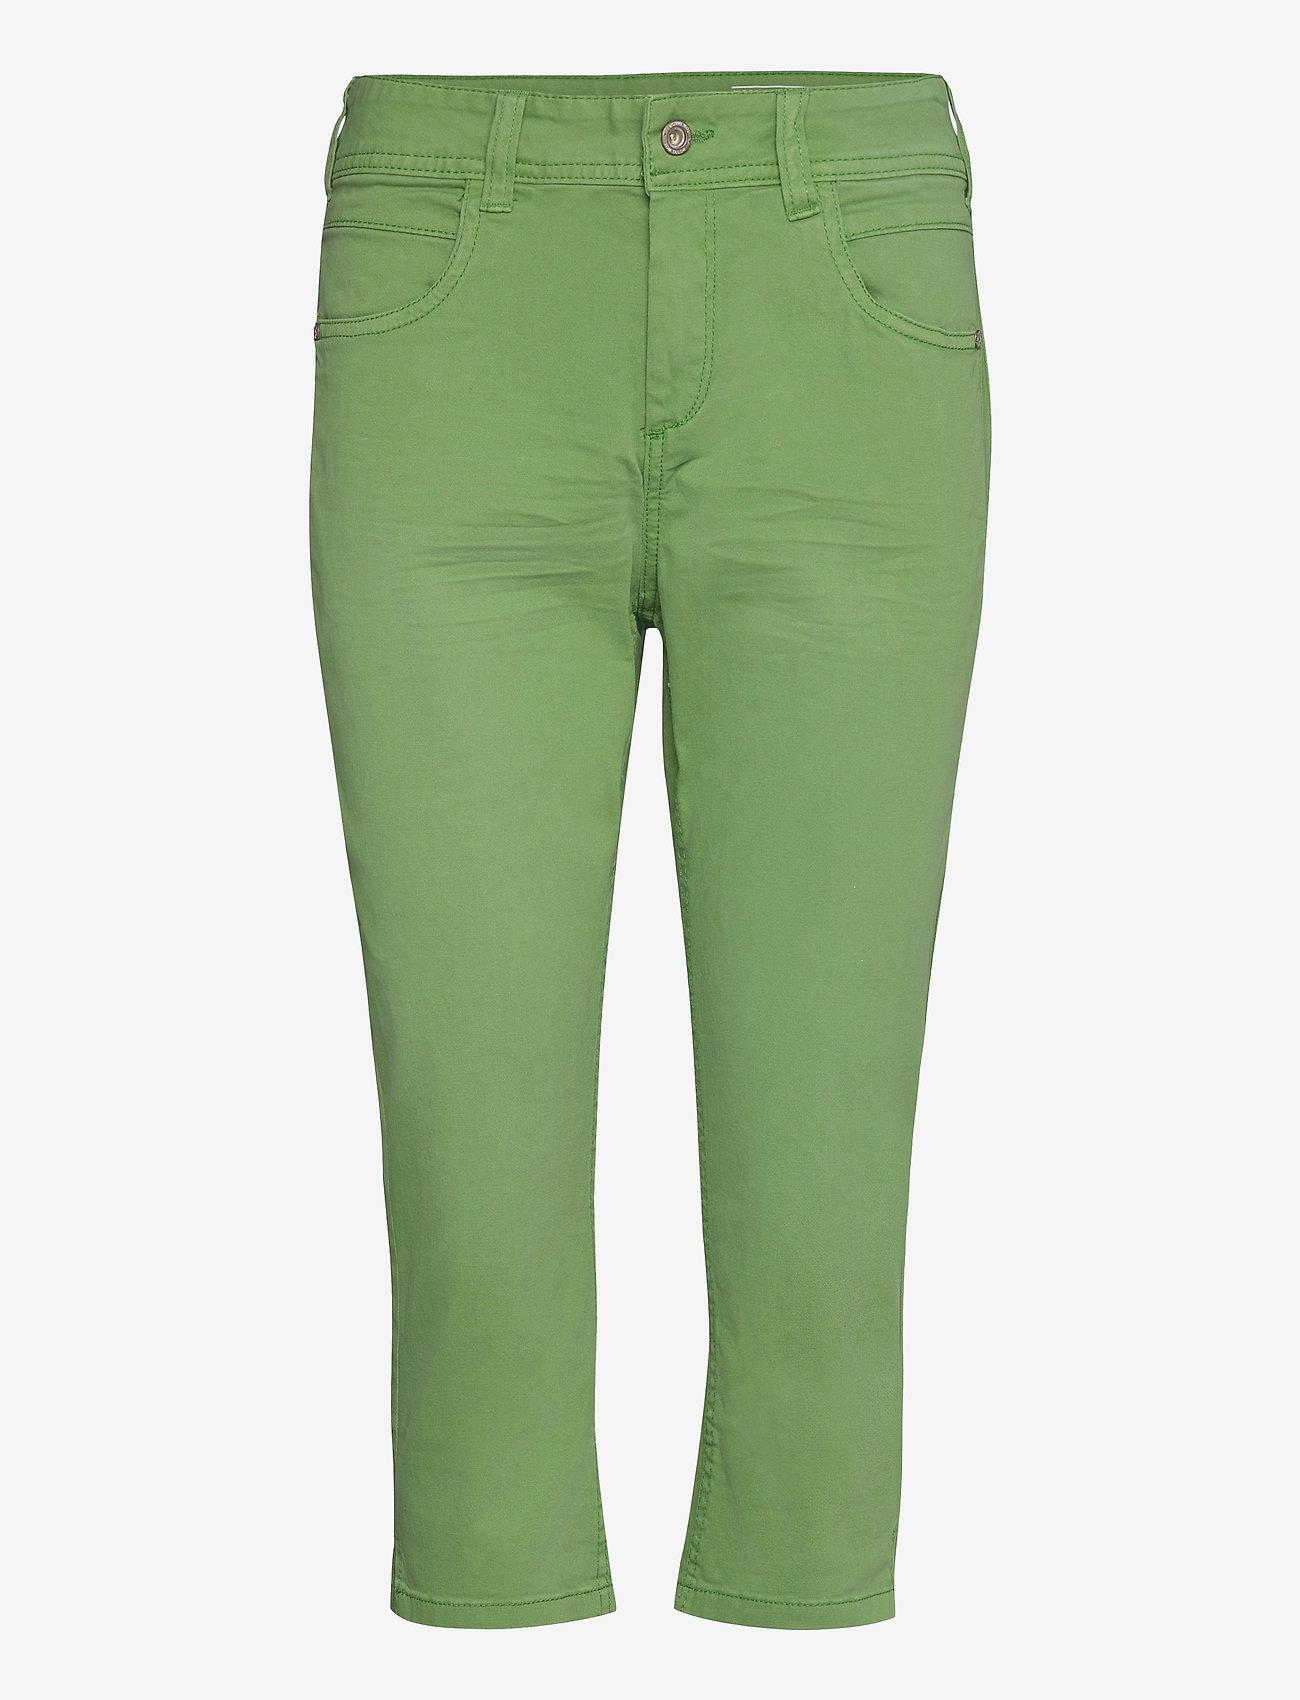 Tom Tailor - Tom Tailor K - pantalons capri - sundried turf green - 0